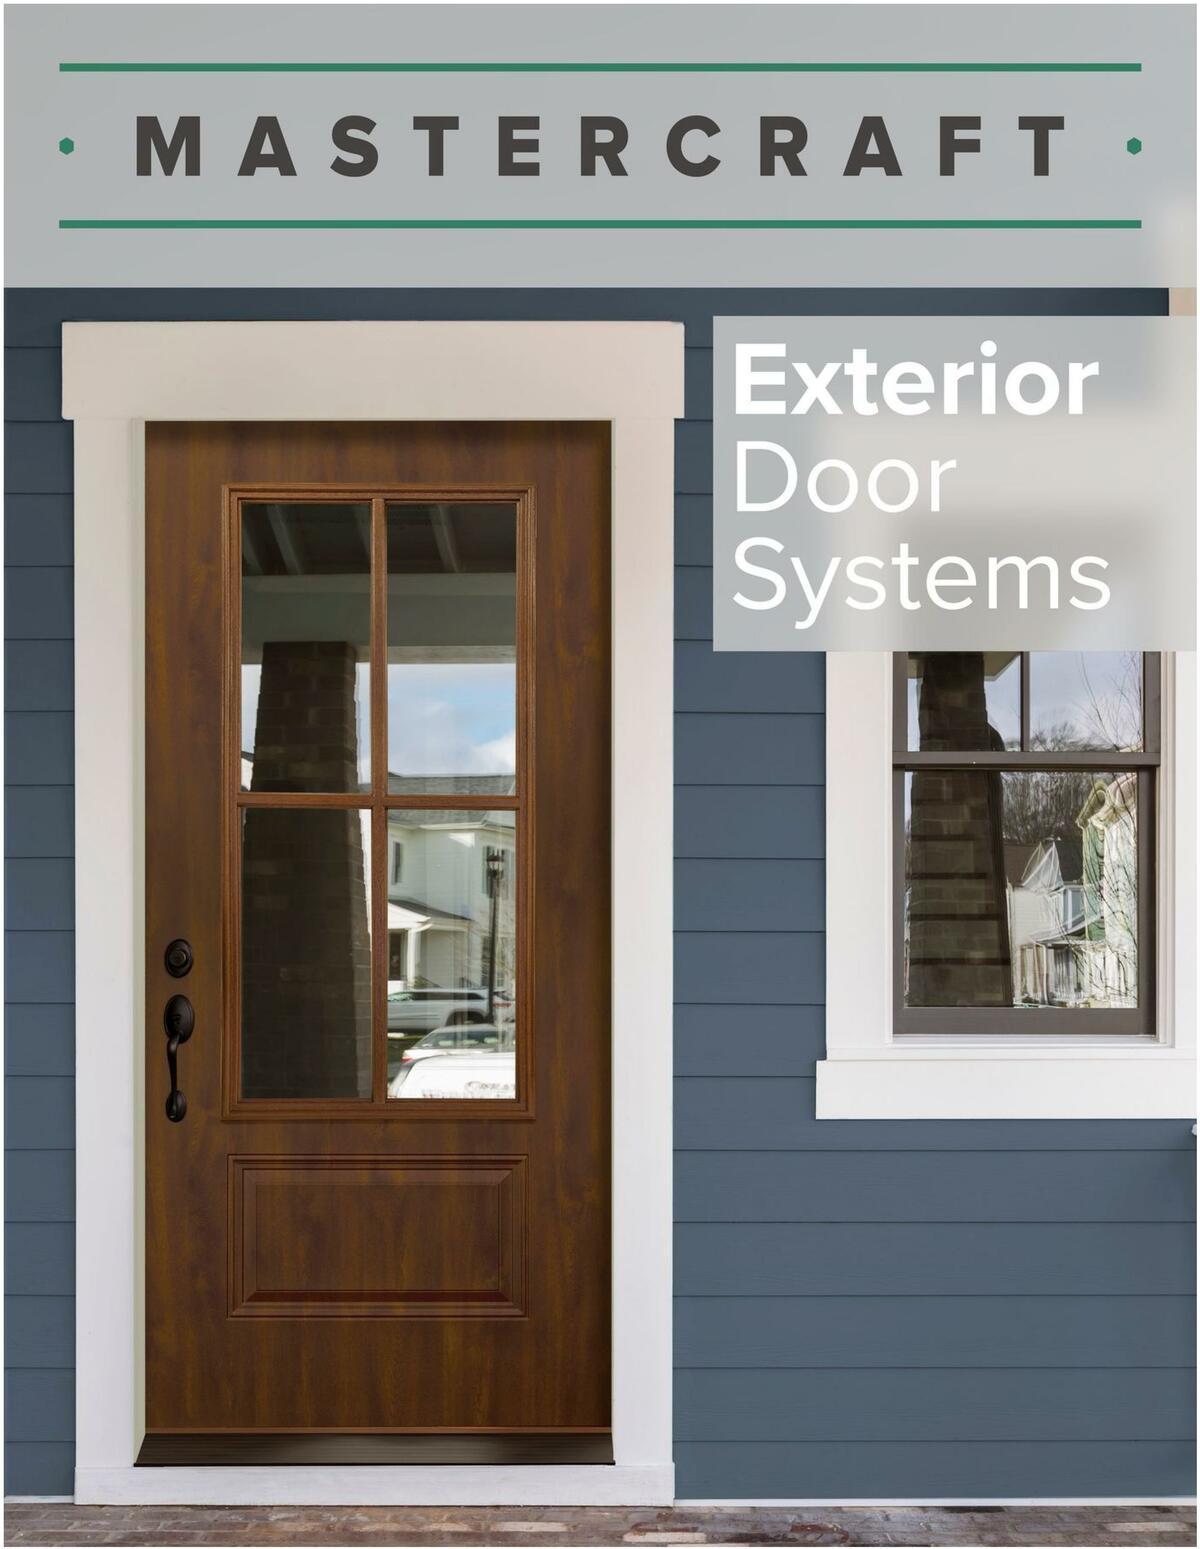 Menards MASTERCRAFT Exterior Doors Weekly Ad from June 14